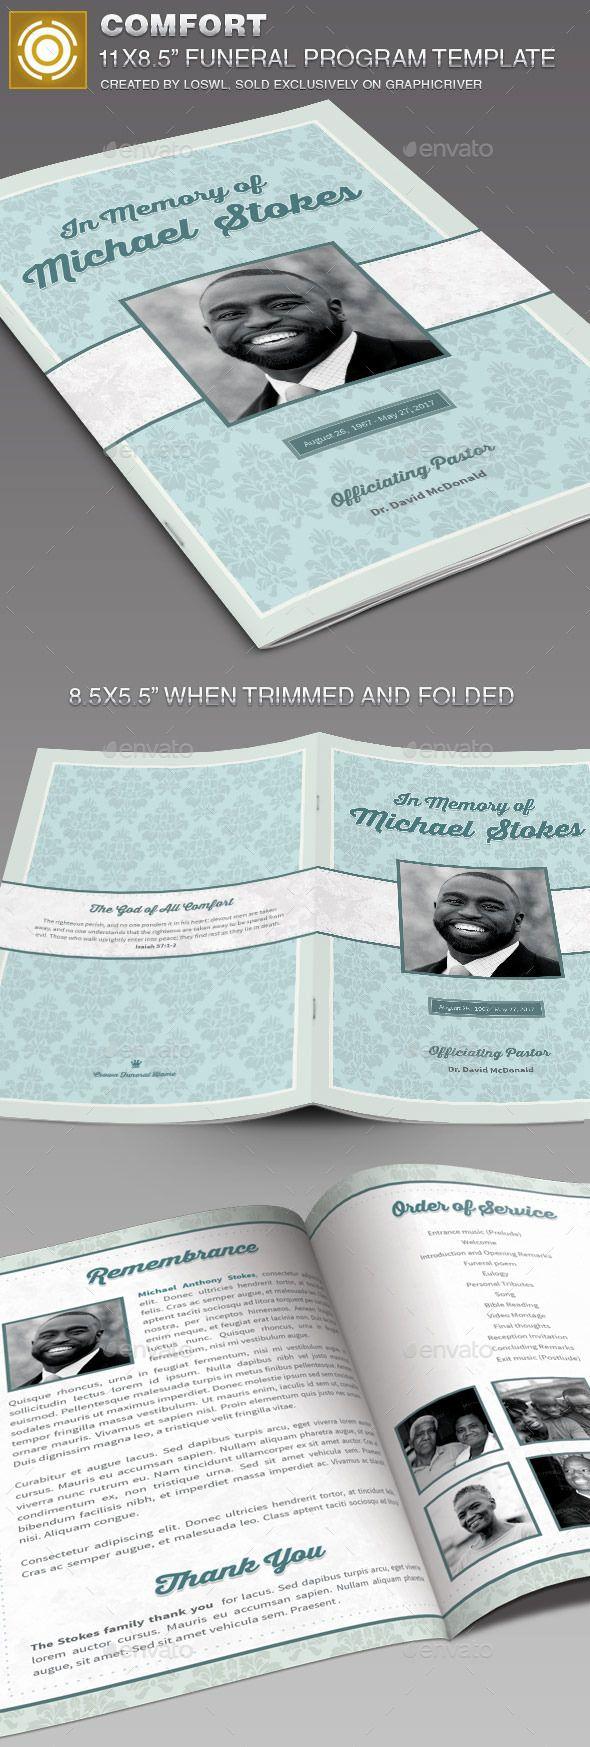 51 best Funeral Program Templates images on Pinterest   Program ...